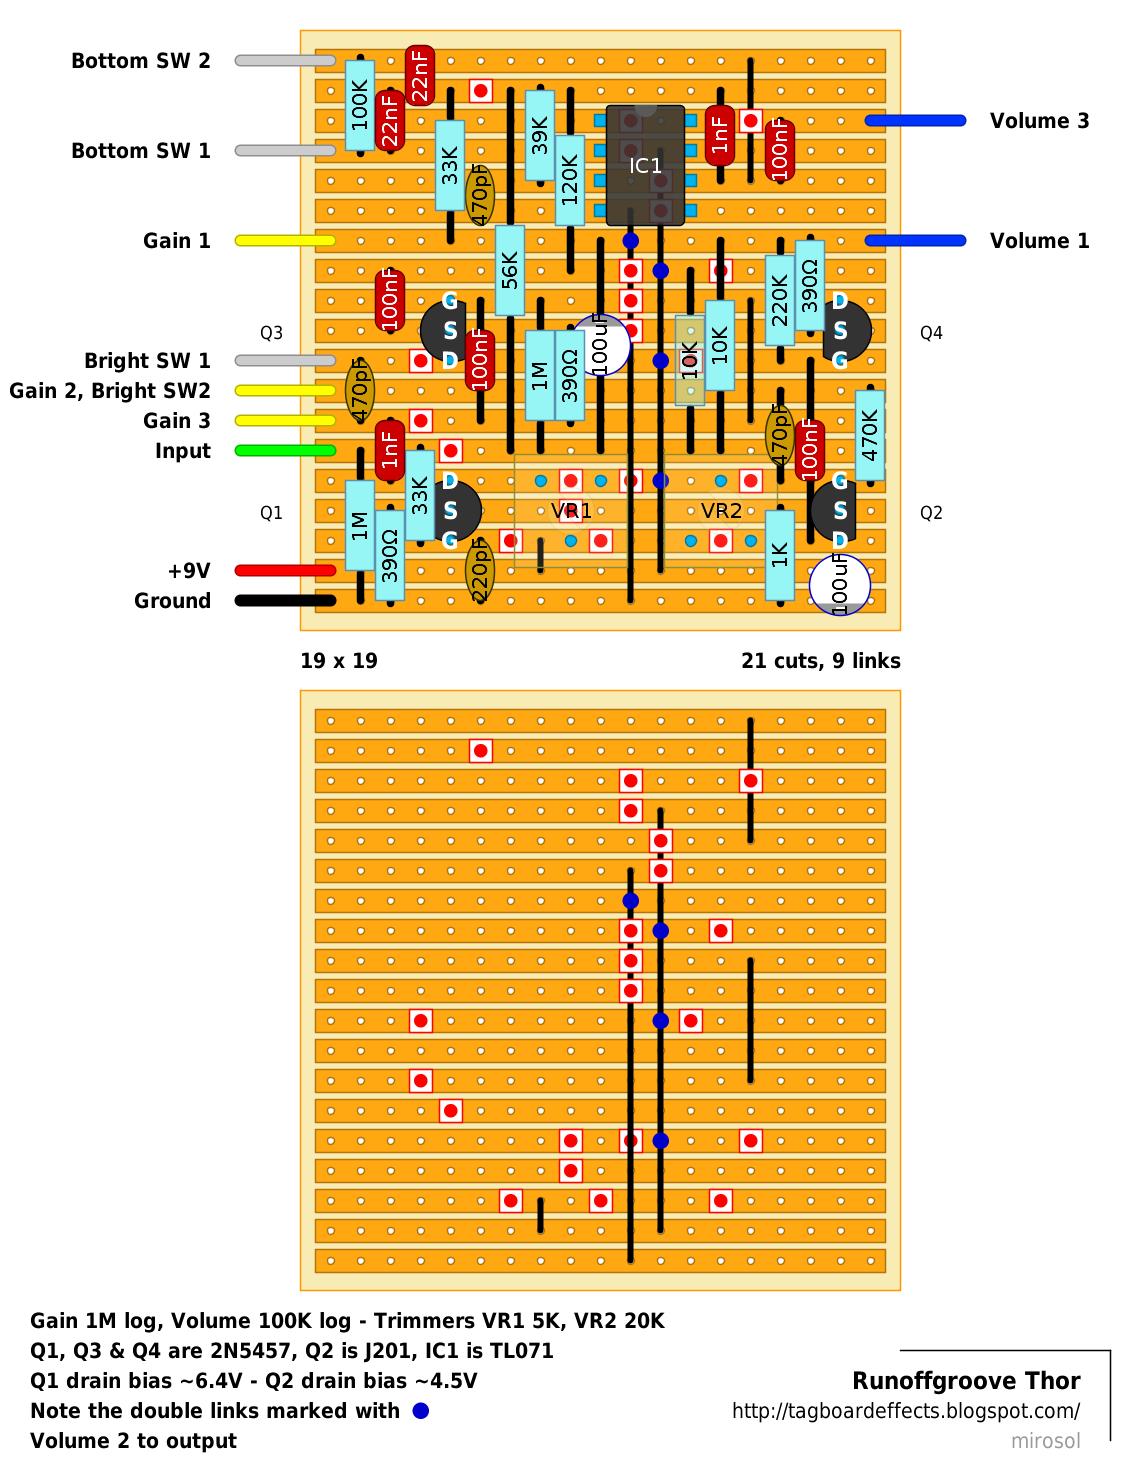 wiring diagram thor ace 23 wiring diagram images hifonics thor wiring diagram thor ace wiring diagram [ 1121 x 1476 Pixel ]